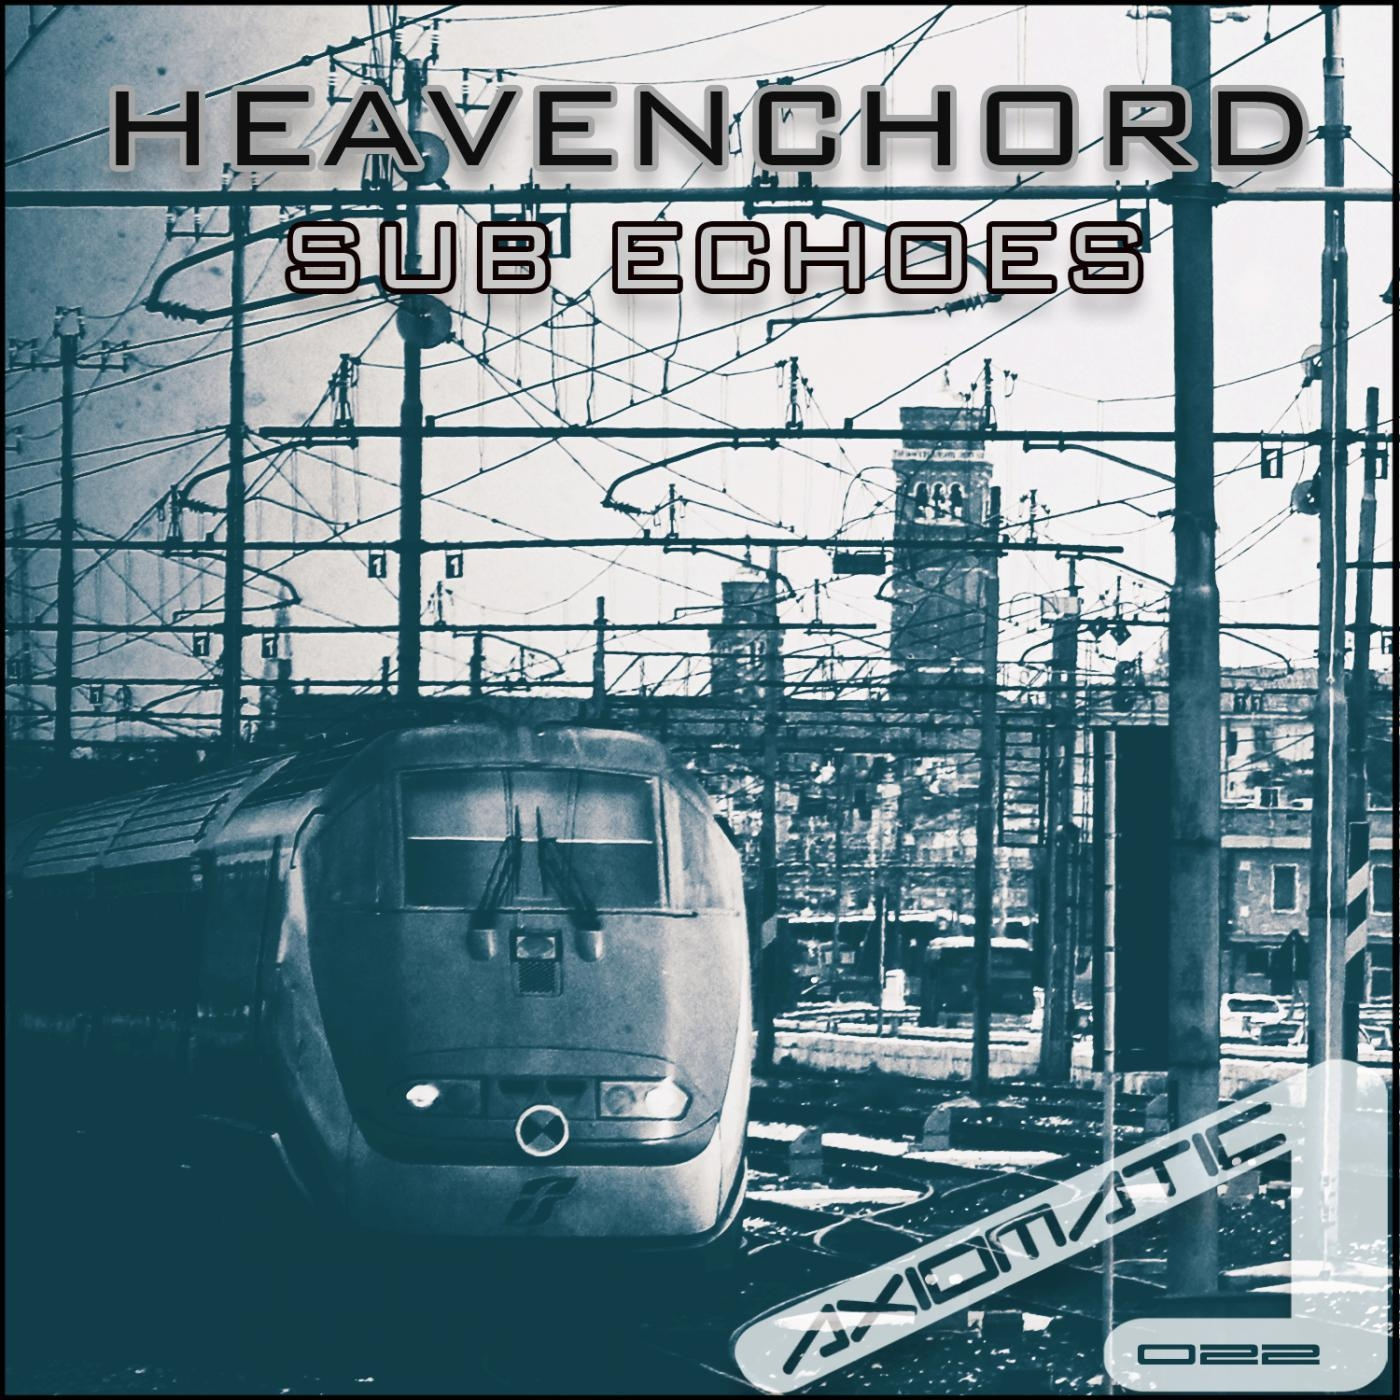 Heavenchord - Through The Woods (Strange mix)